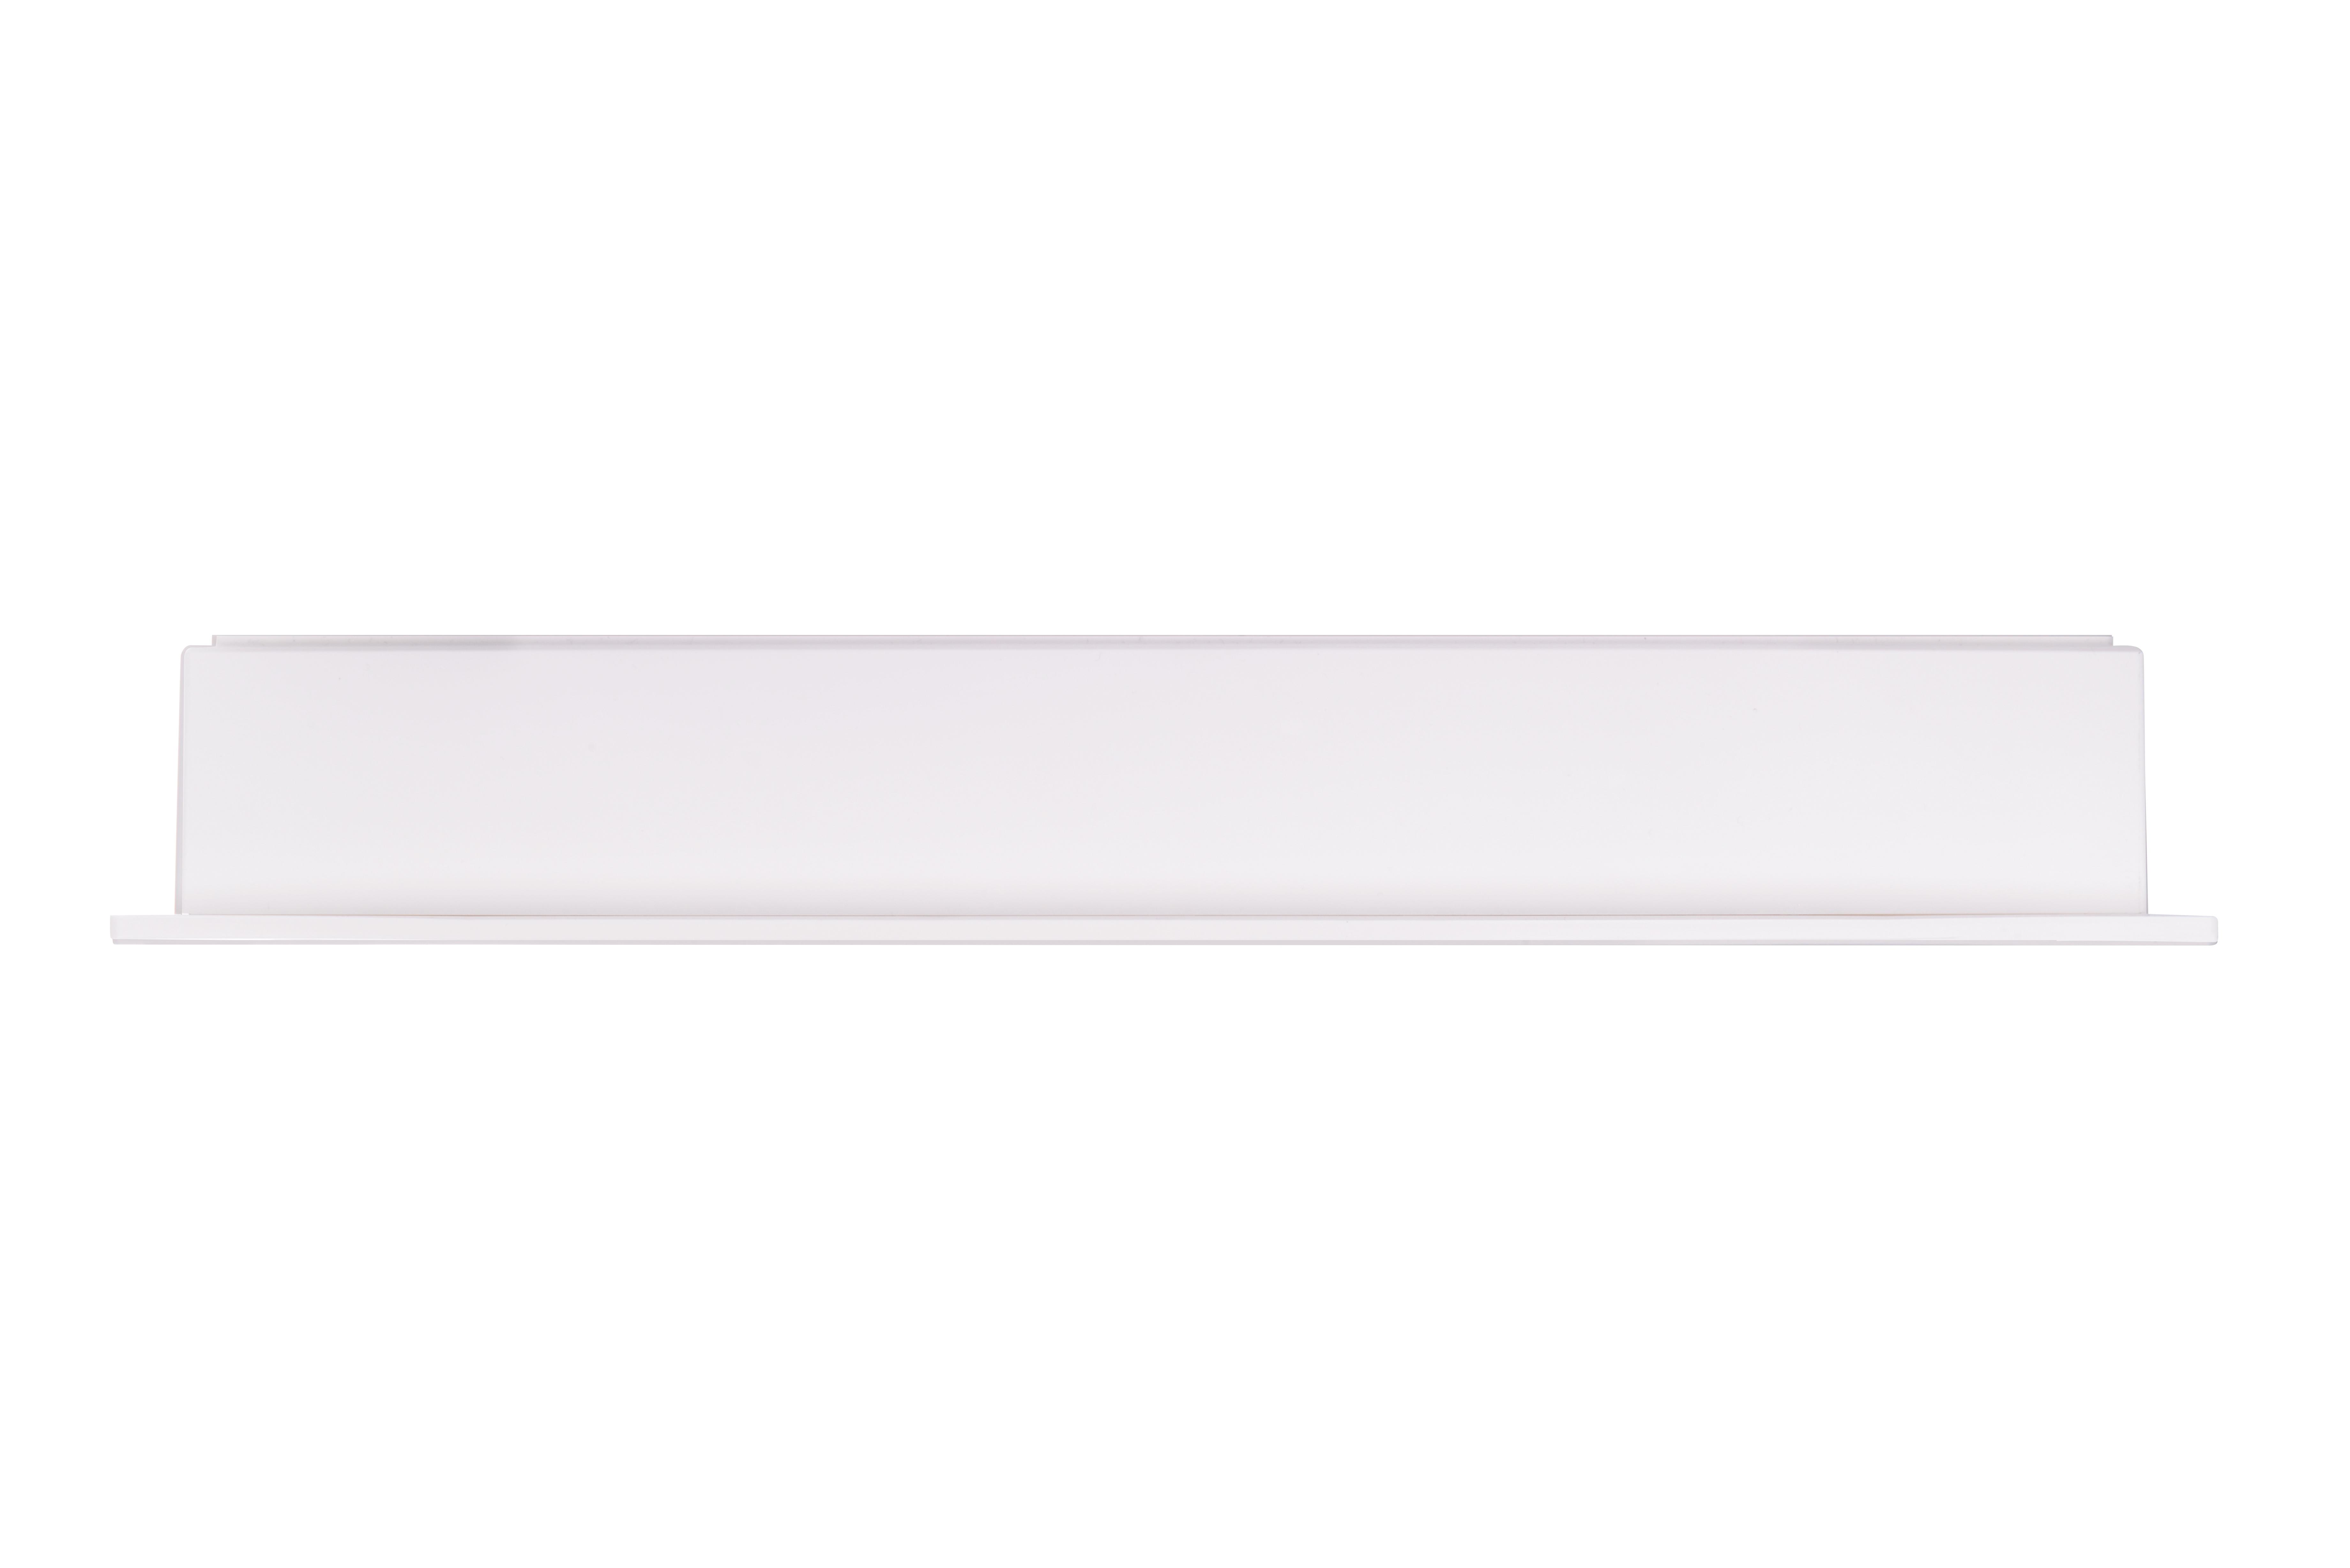 Lampa emergenta led Intelight 94504   3h mentinut test automat 5